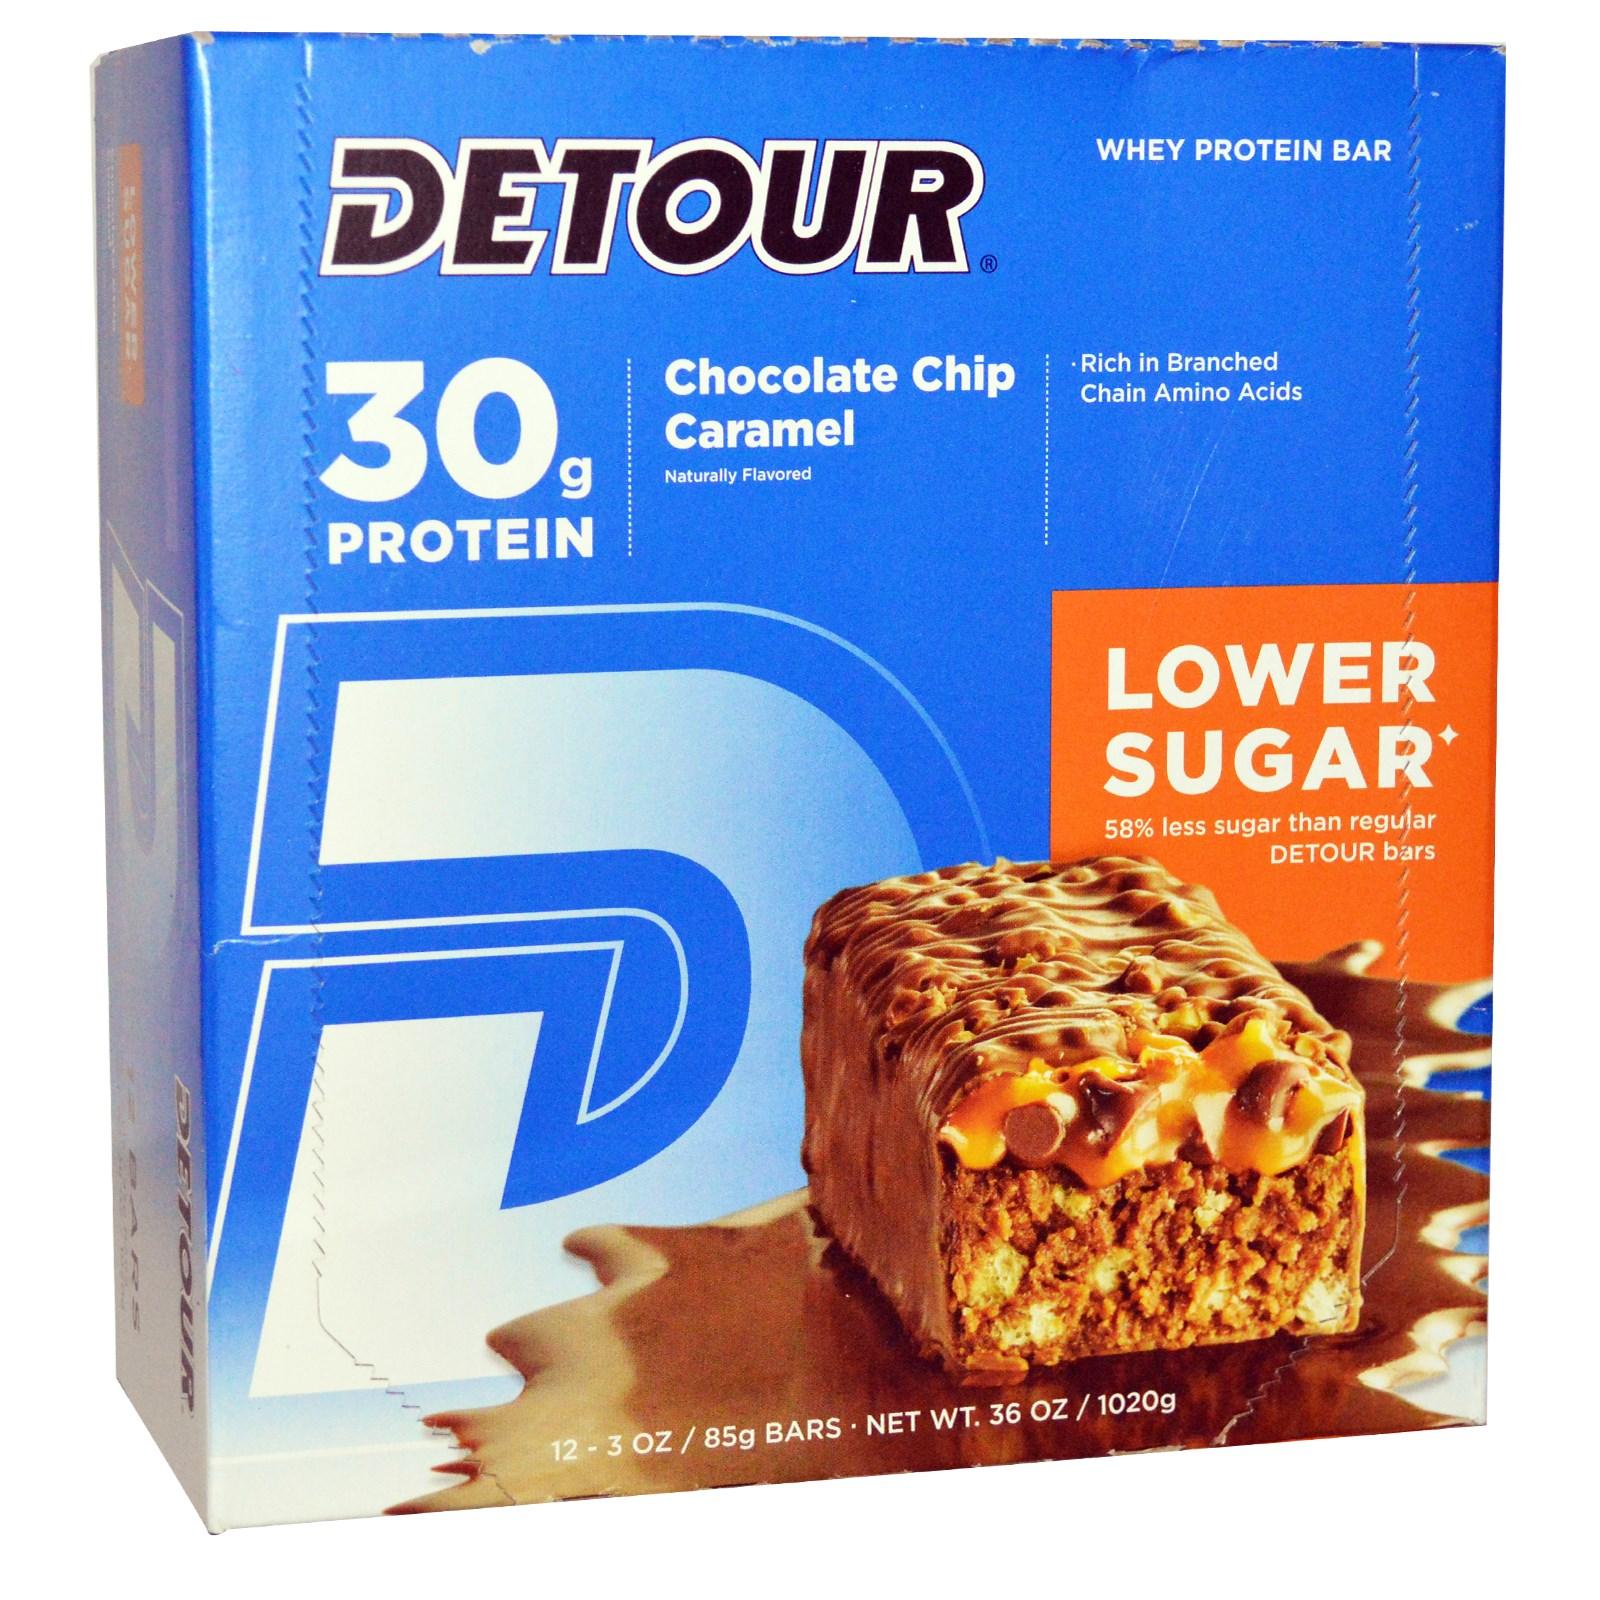 Detour, Whey Protein Bar, Chocolate Chip Caramel, 12 Bars...